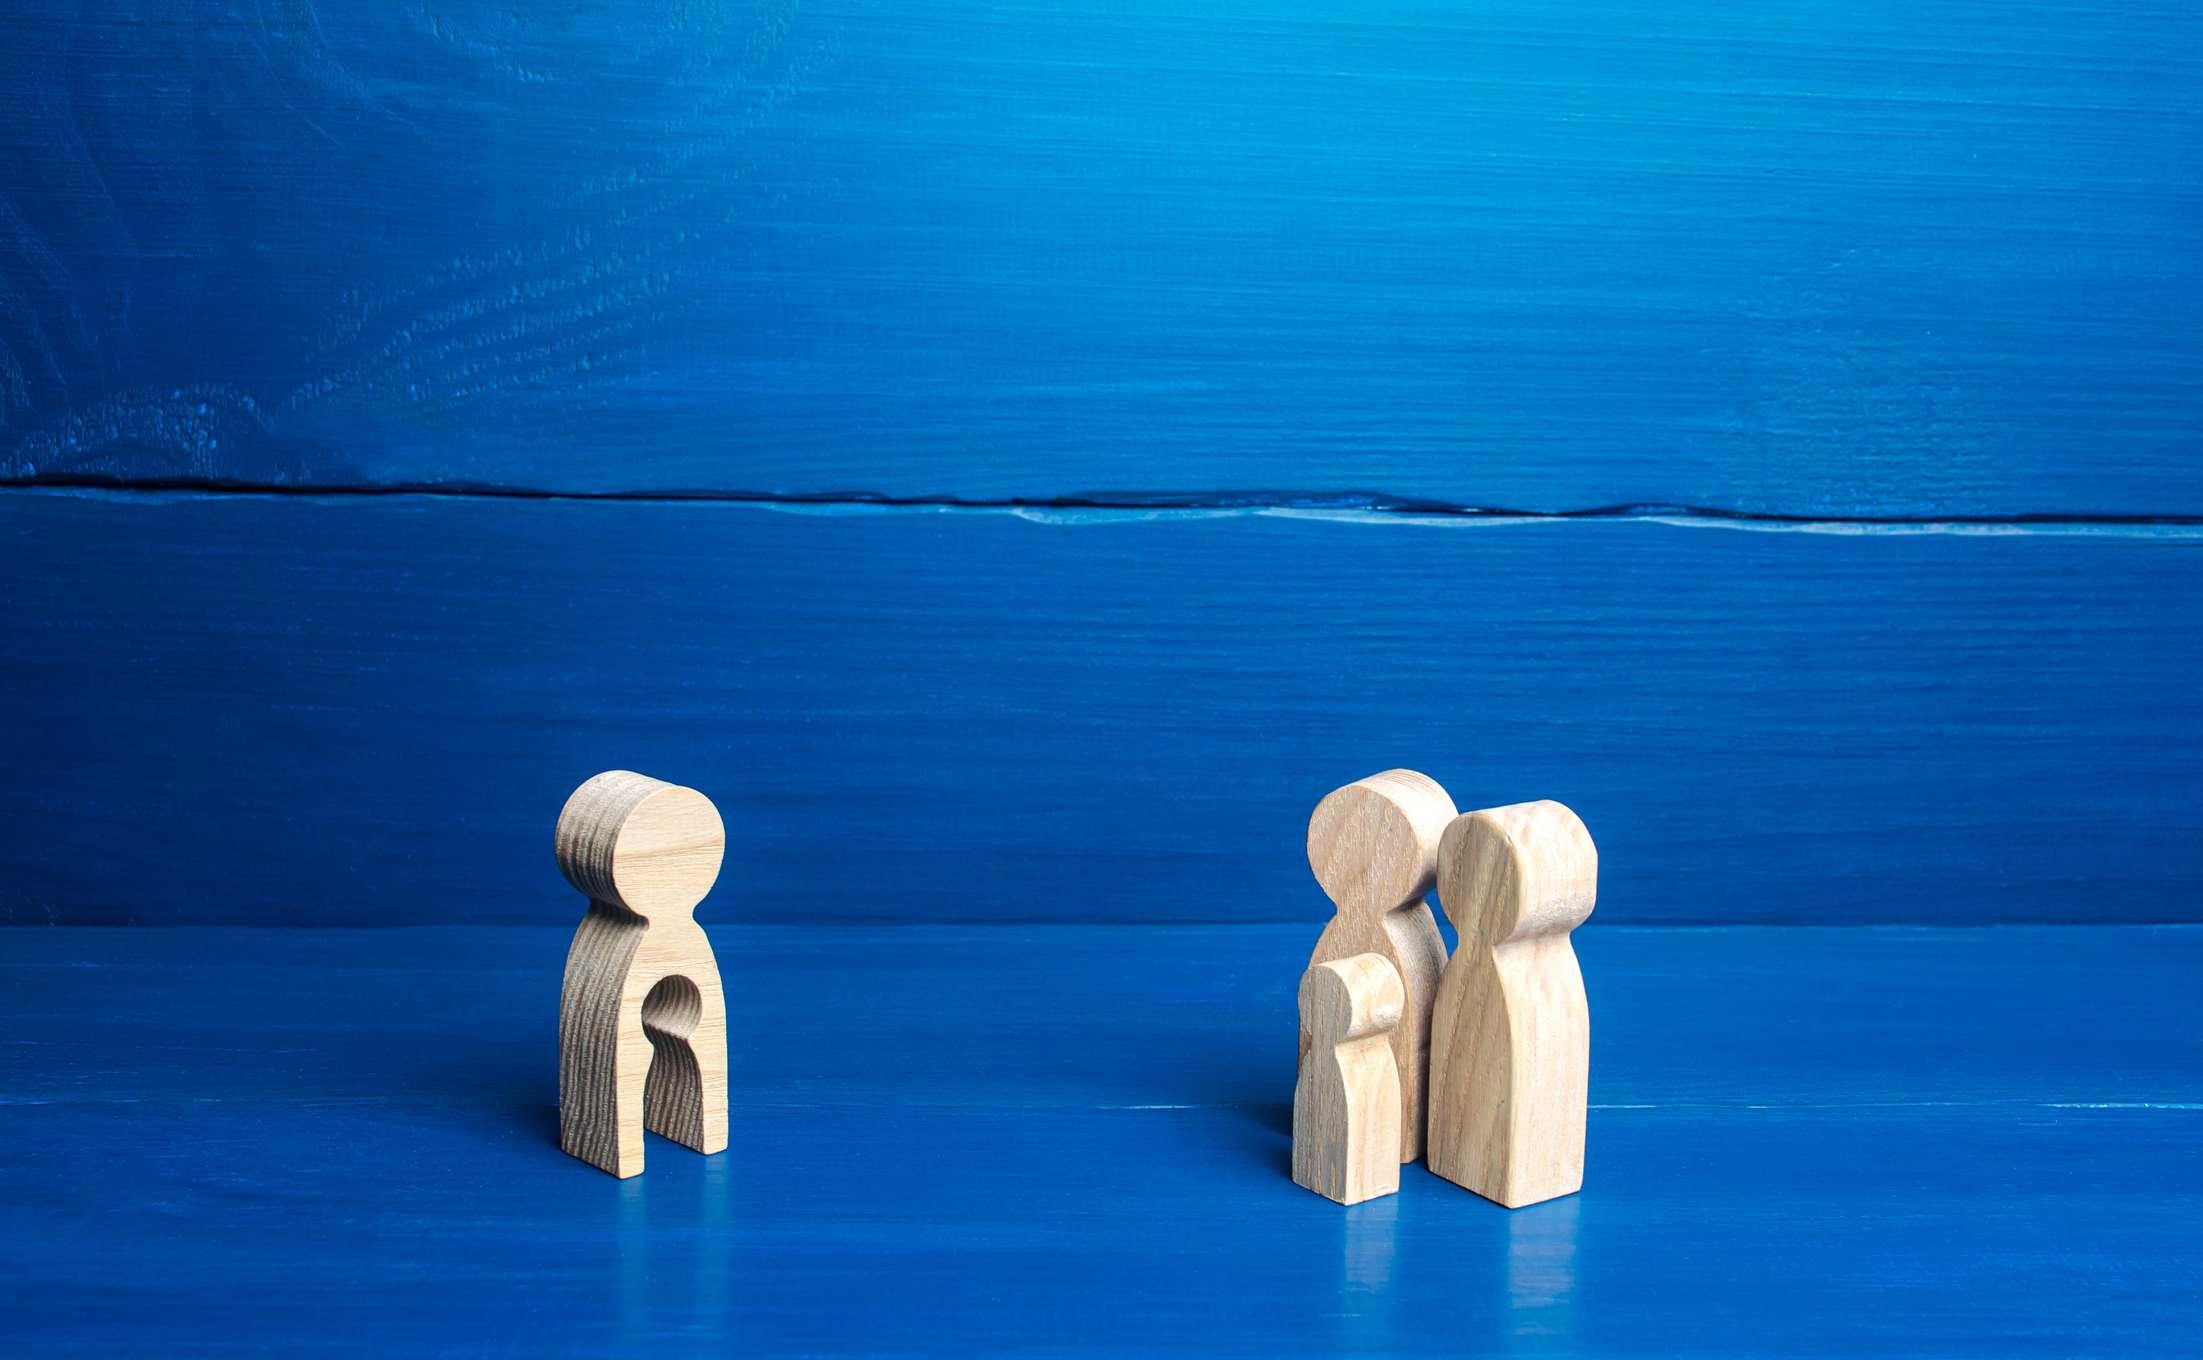 Wooden figurines depict surrogate pregnancy